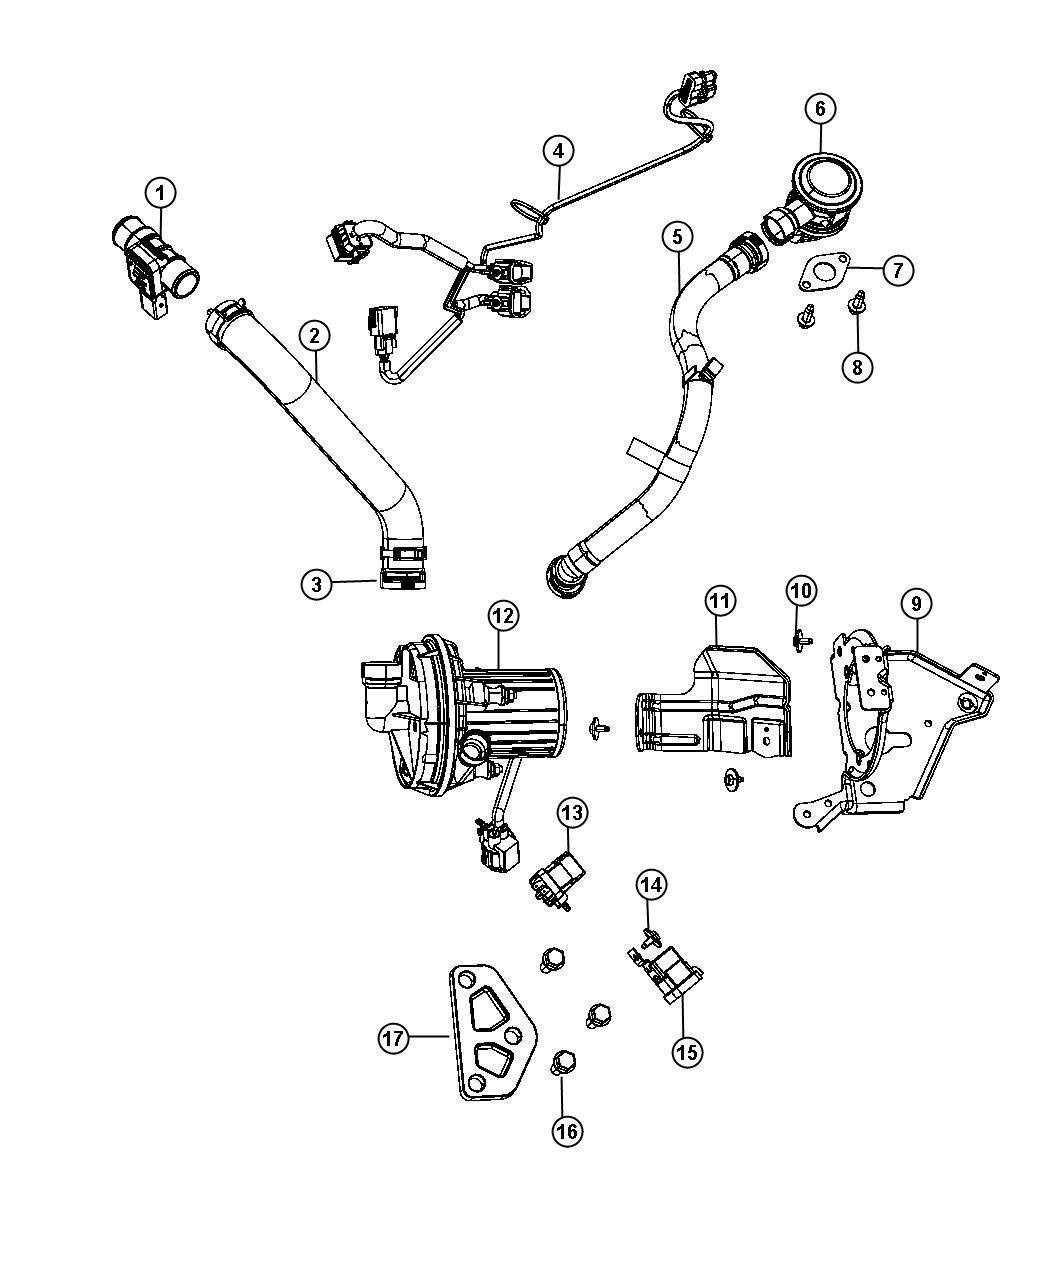 2013 Chrysler Town & Country Relay. Radiator fan